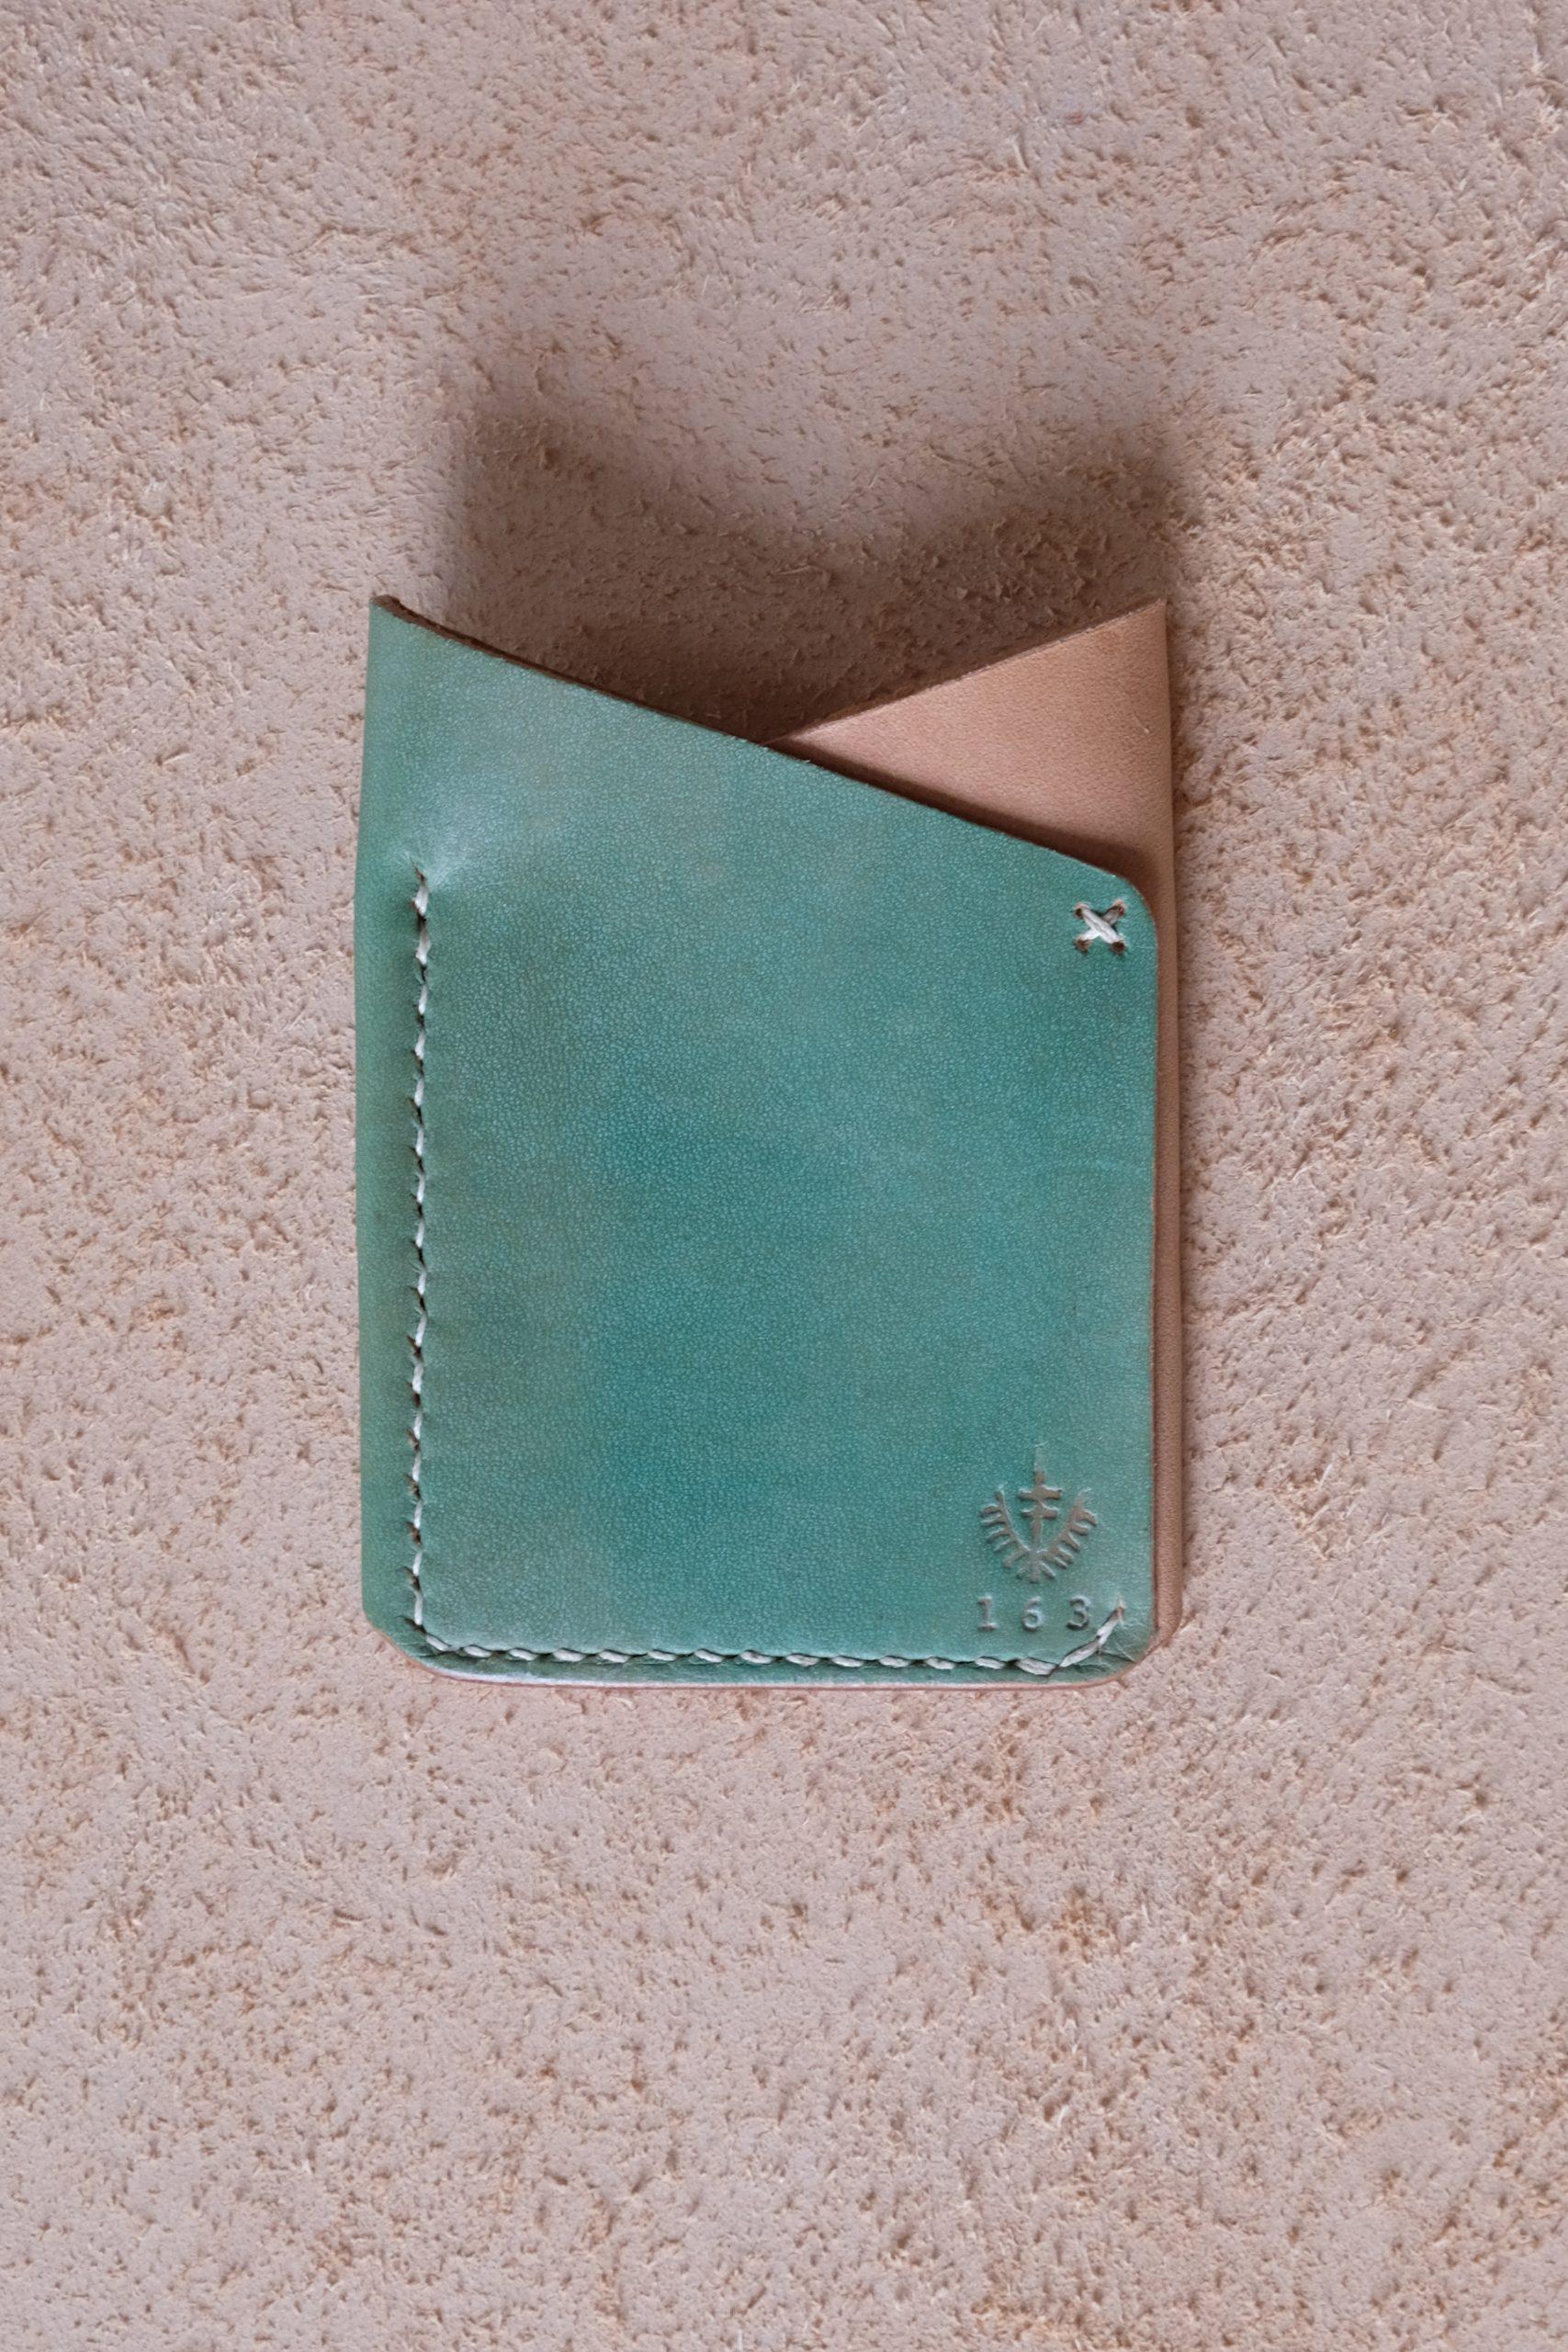 lerif designs leather fox ears cardholder in pistachio on beige backgroun